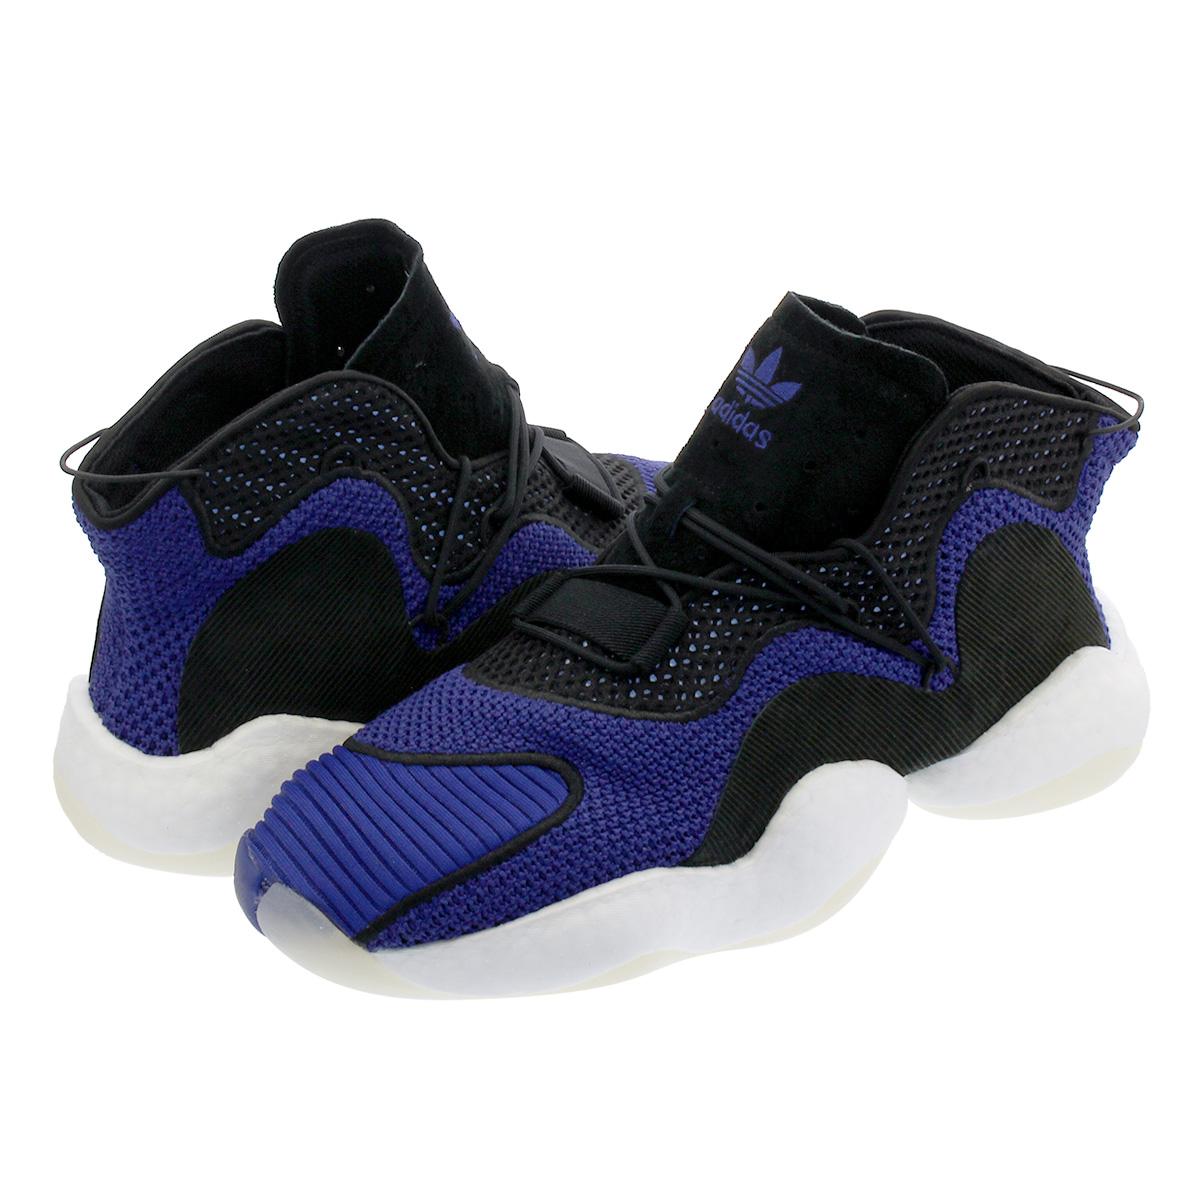 super popular a74d3 3da9c adidas CRAZY BYW LVL I Adidas crazy BYW LVL I REAL PURPLE/CORE  BLACK/RUNNING WHITE b37550